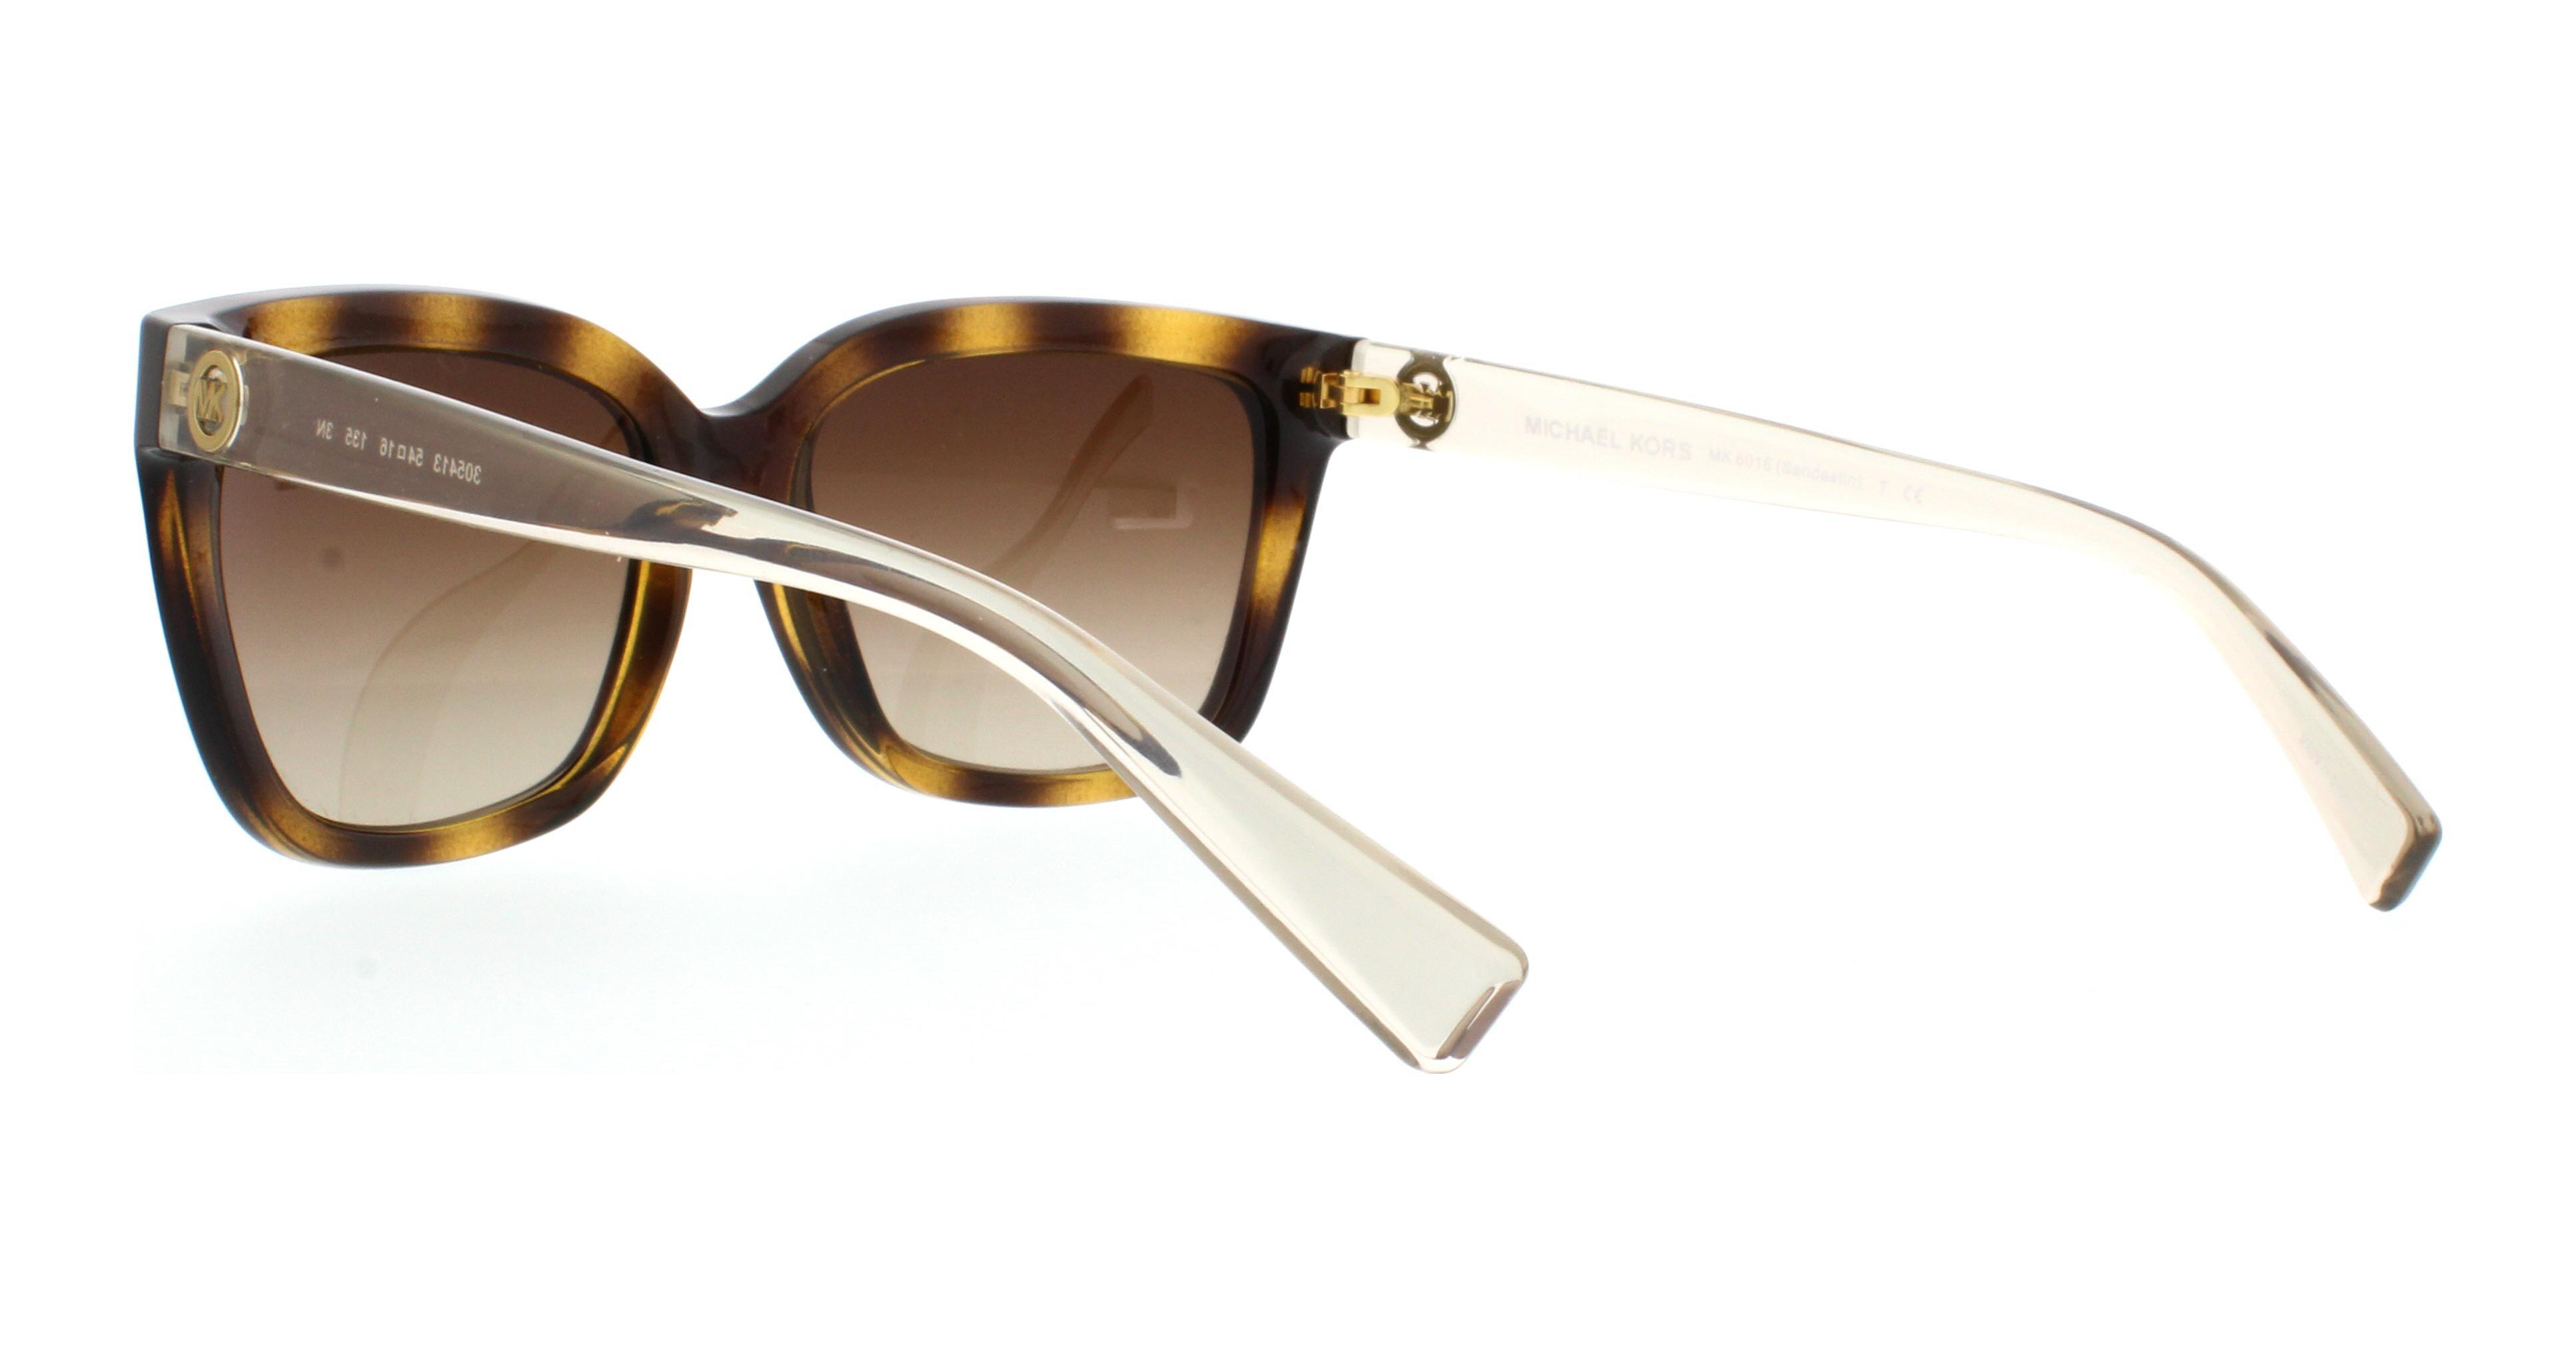 Michael Kors Sandestin Sonnenbrille Tortoise und Transparent 305413 54mm UHSJ1VETrG